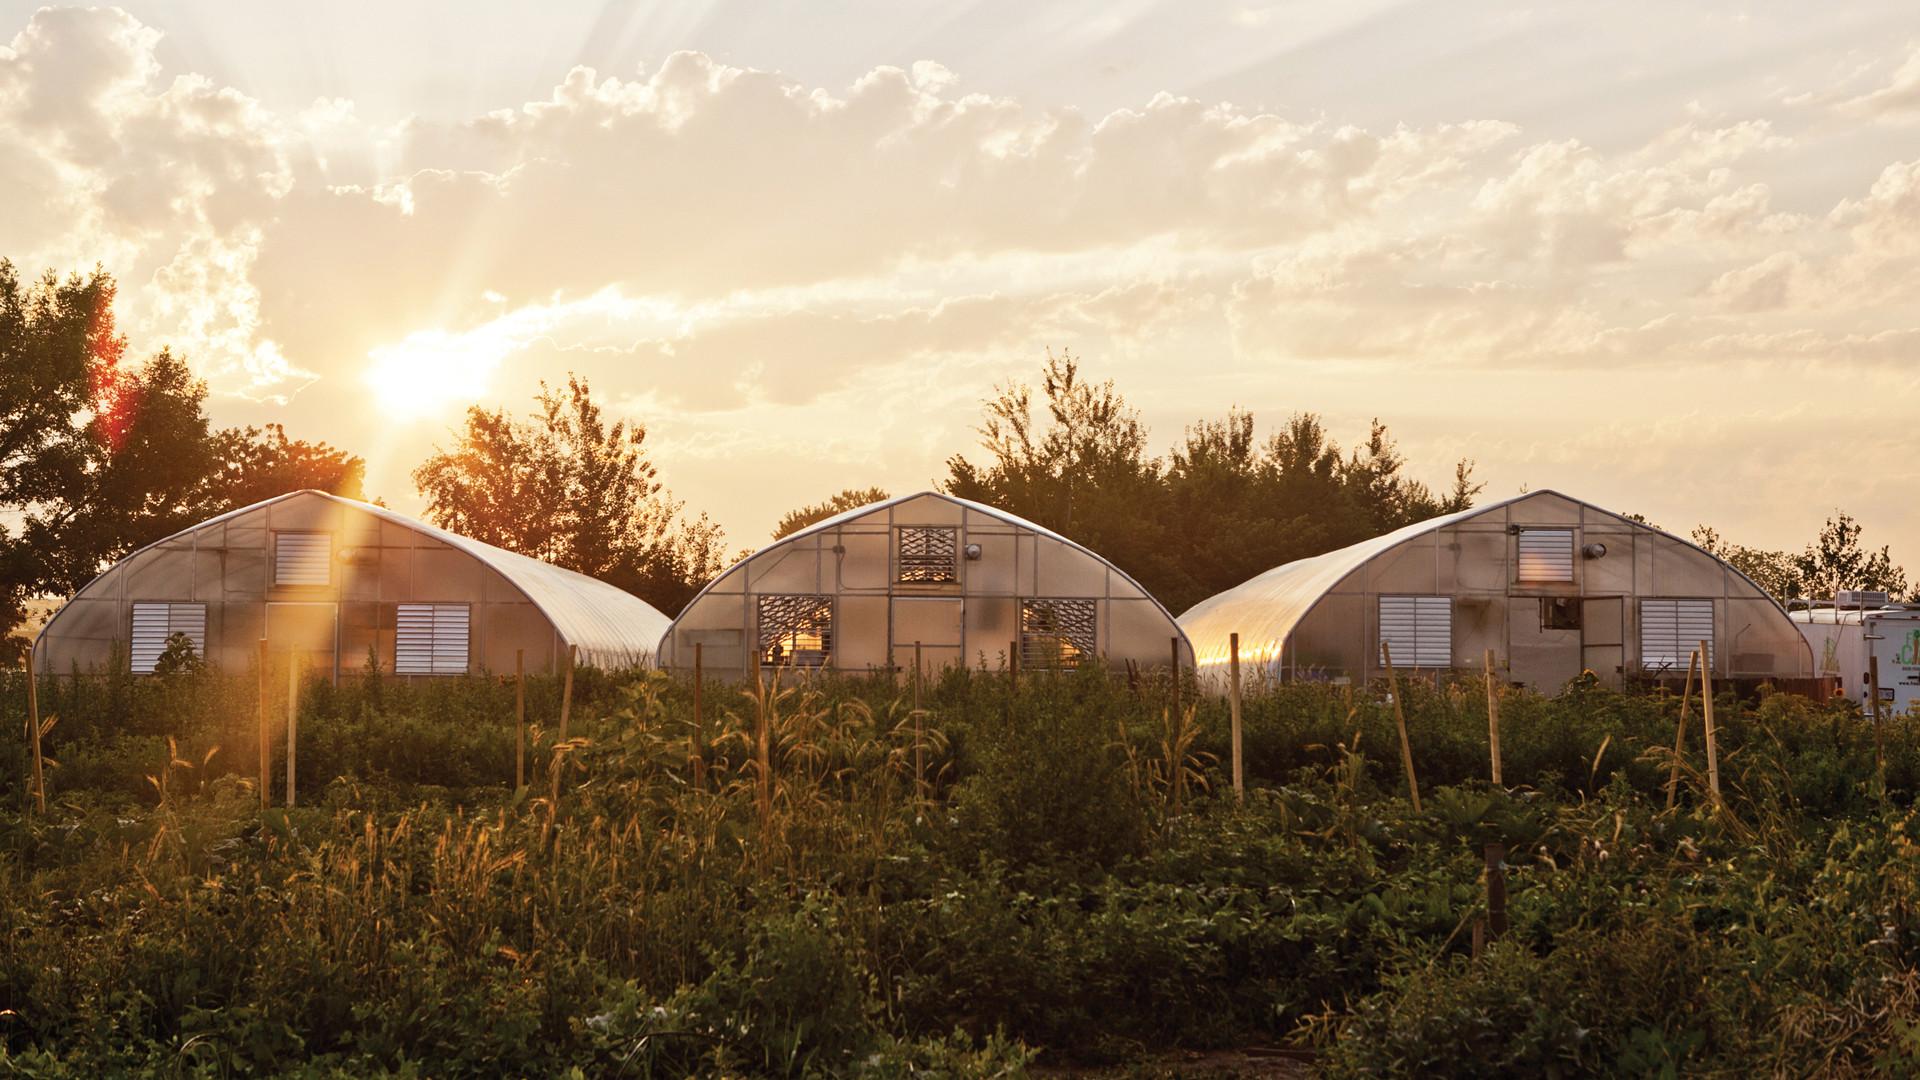 Fresh City Farms greenhouses